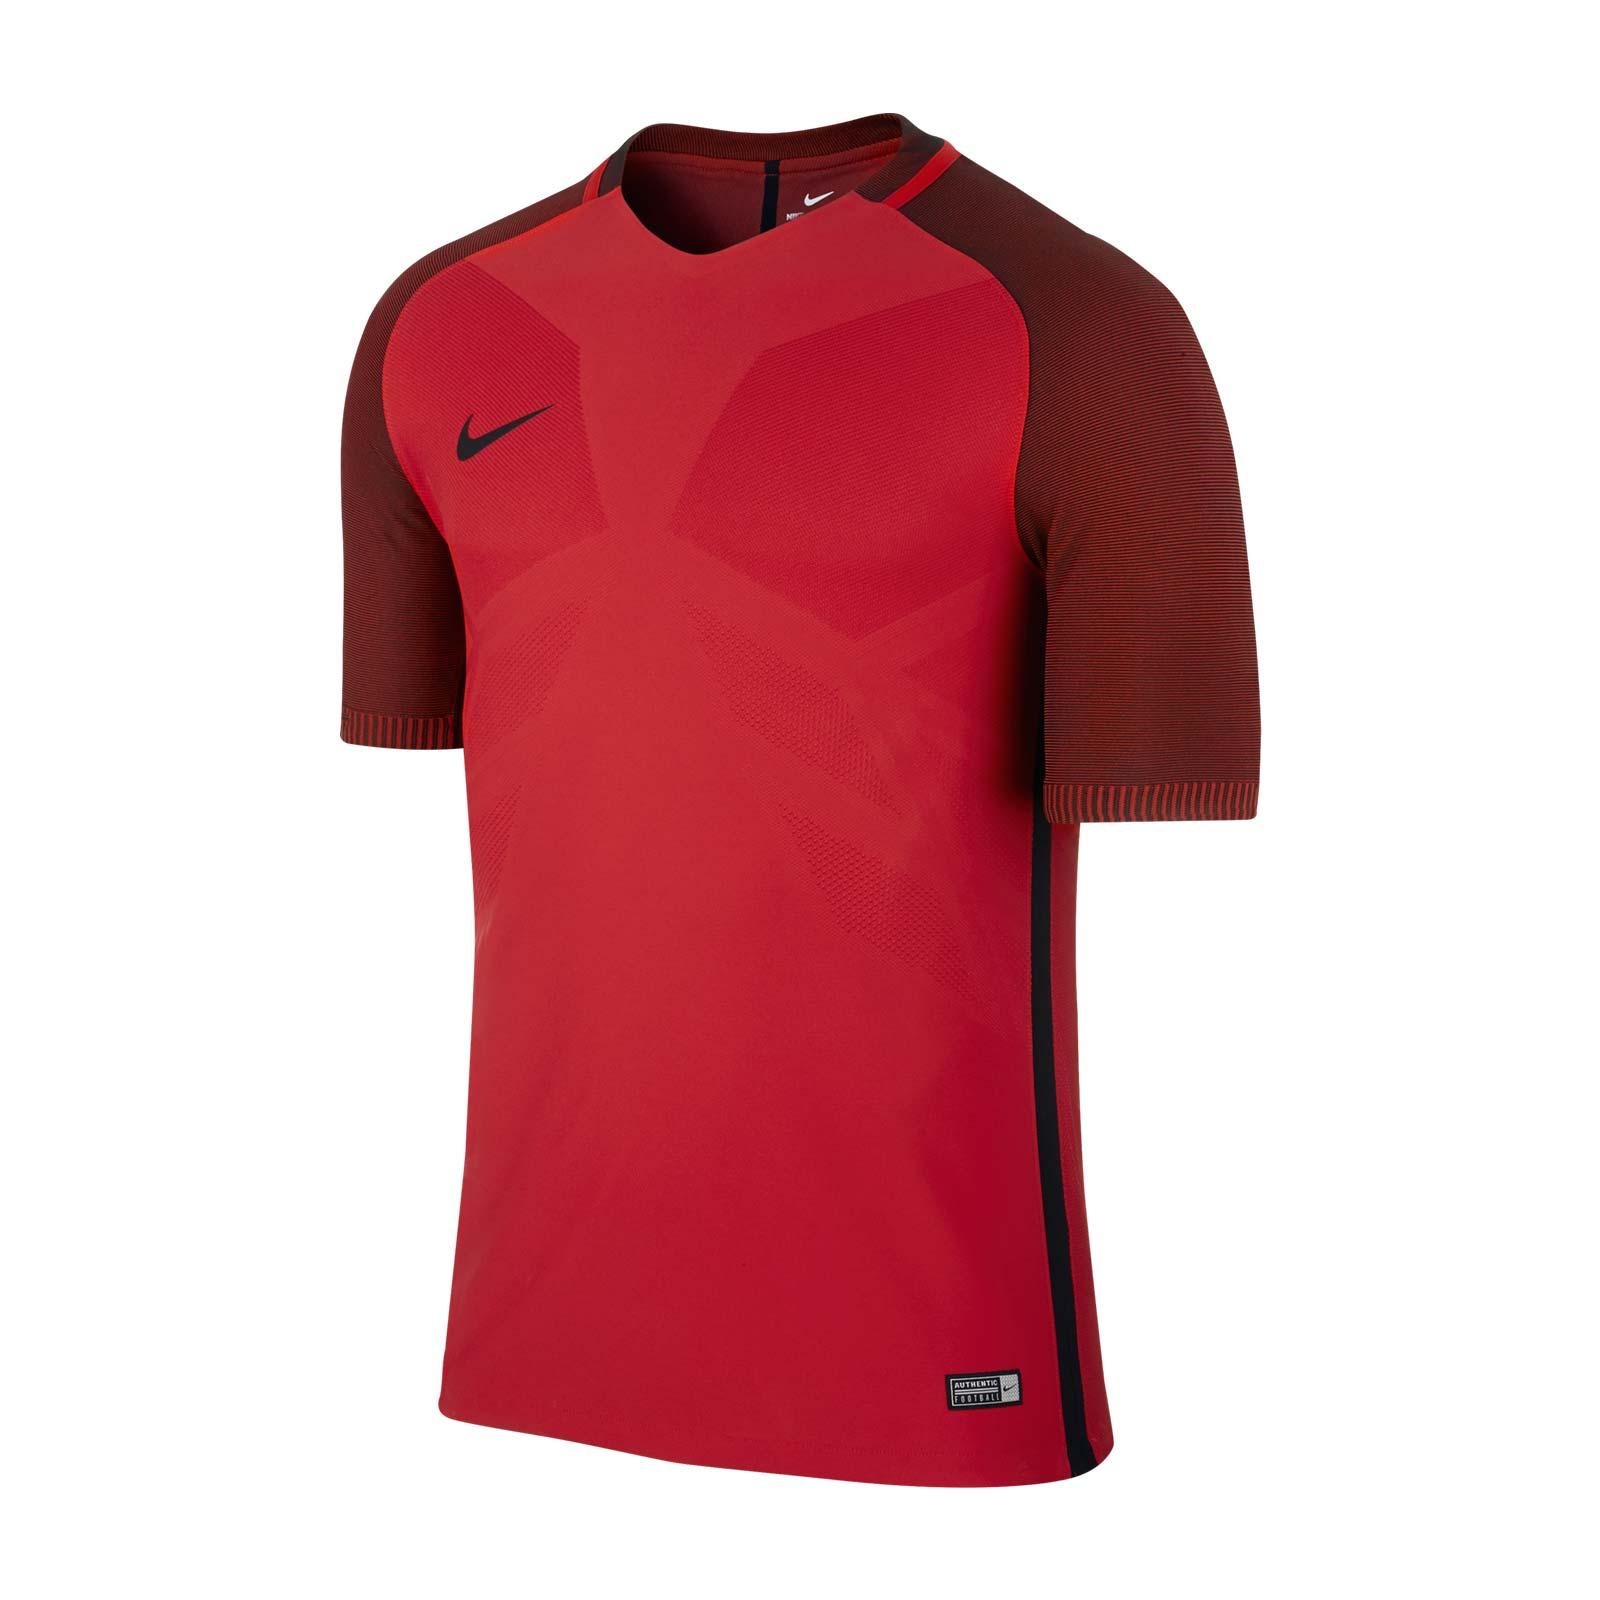 maillot-football-nike-vapor-1-jersey-teamwear-rouge